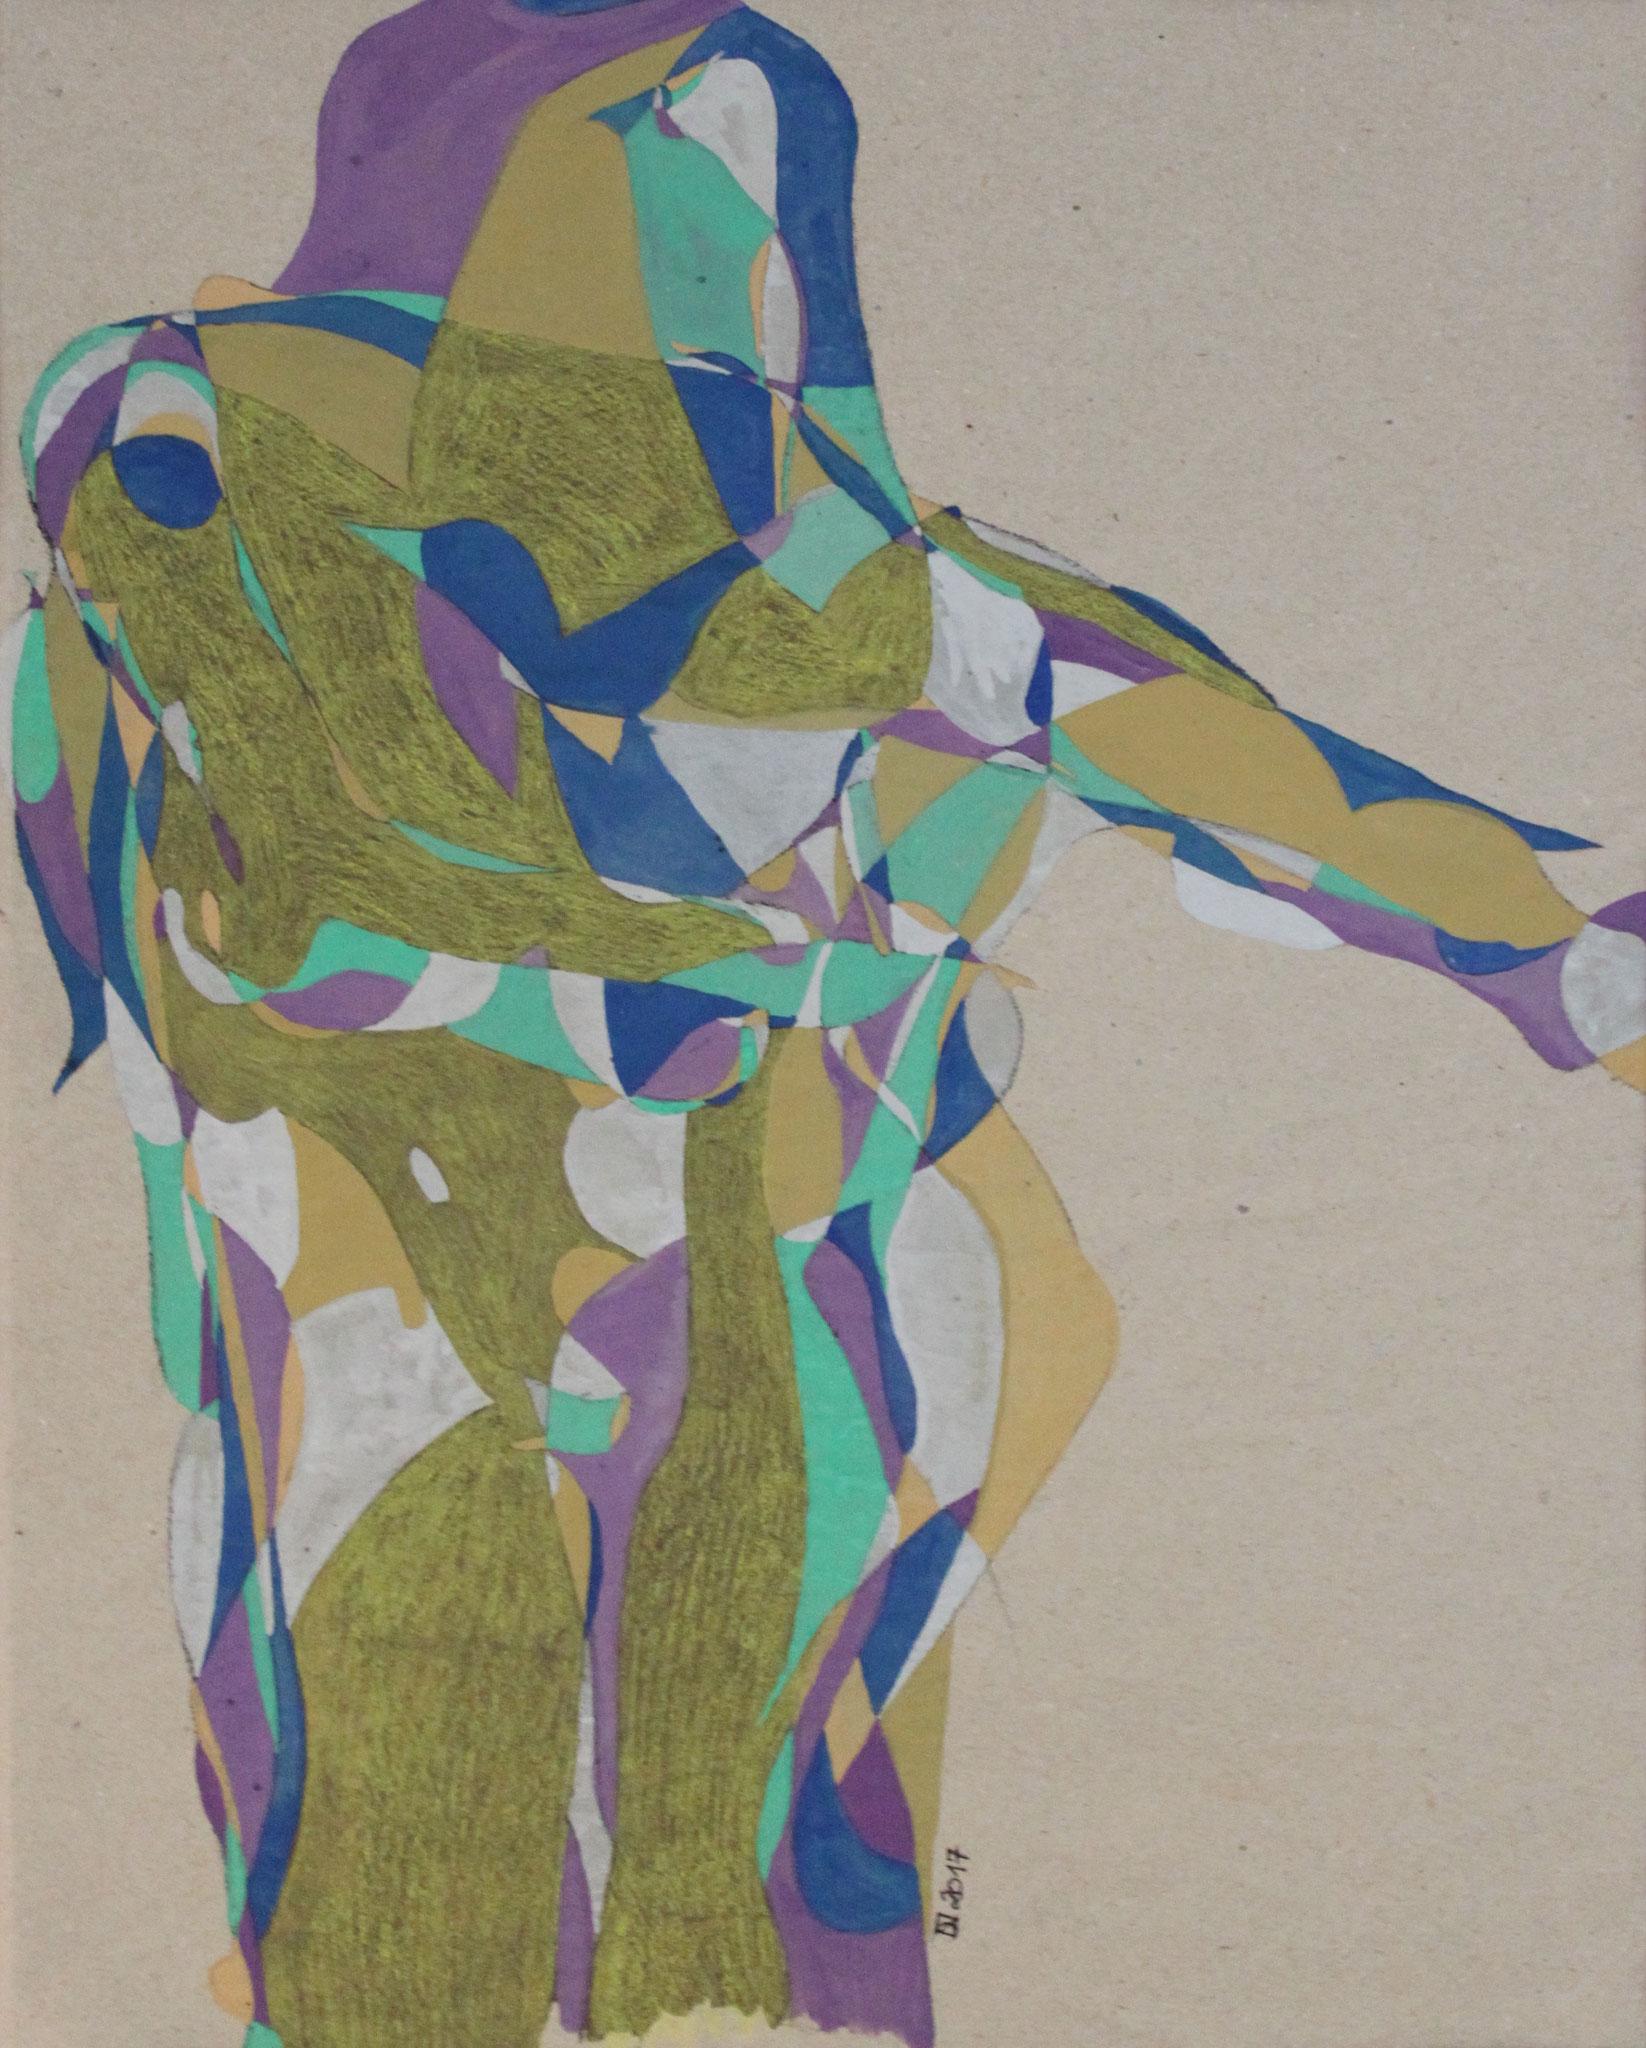 Boogy Woogy,  Aquarell und Buntstift auf Papier, 2017, 48 cm x 37 cm